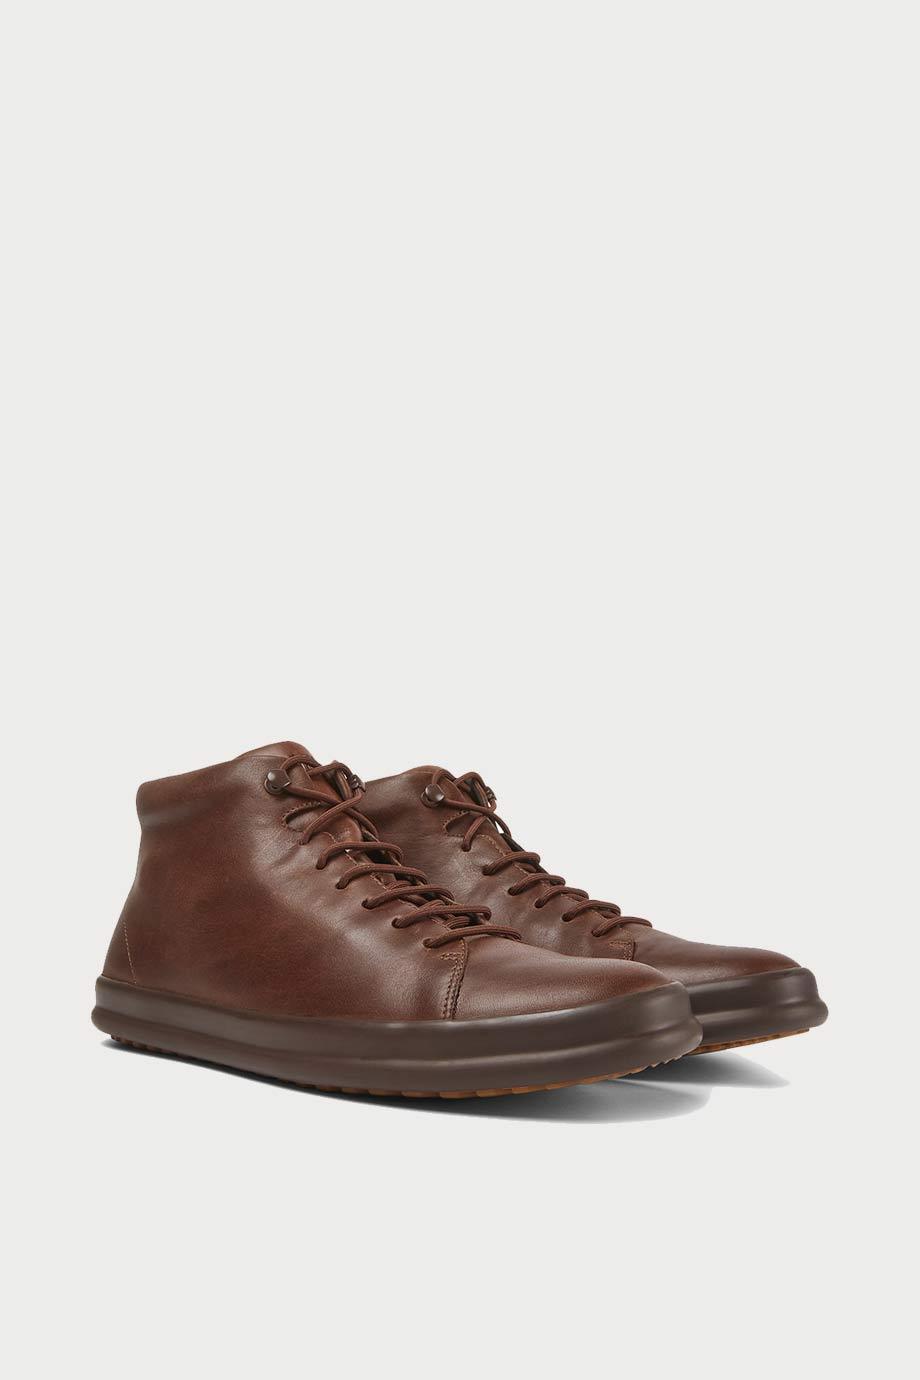 spiridoula metheniti shoes xalkida p K300236 012 camper 2